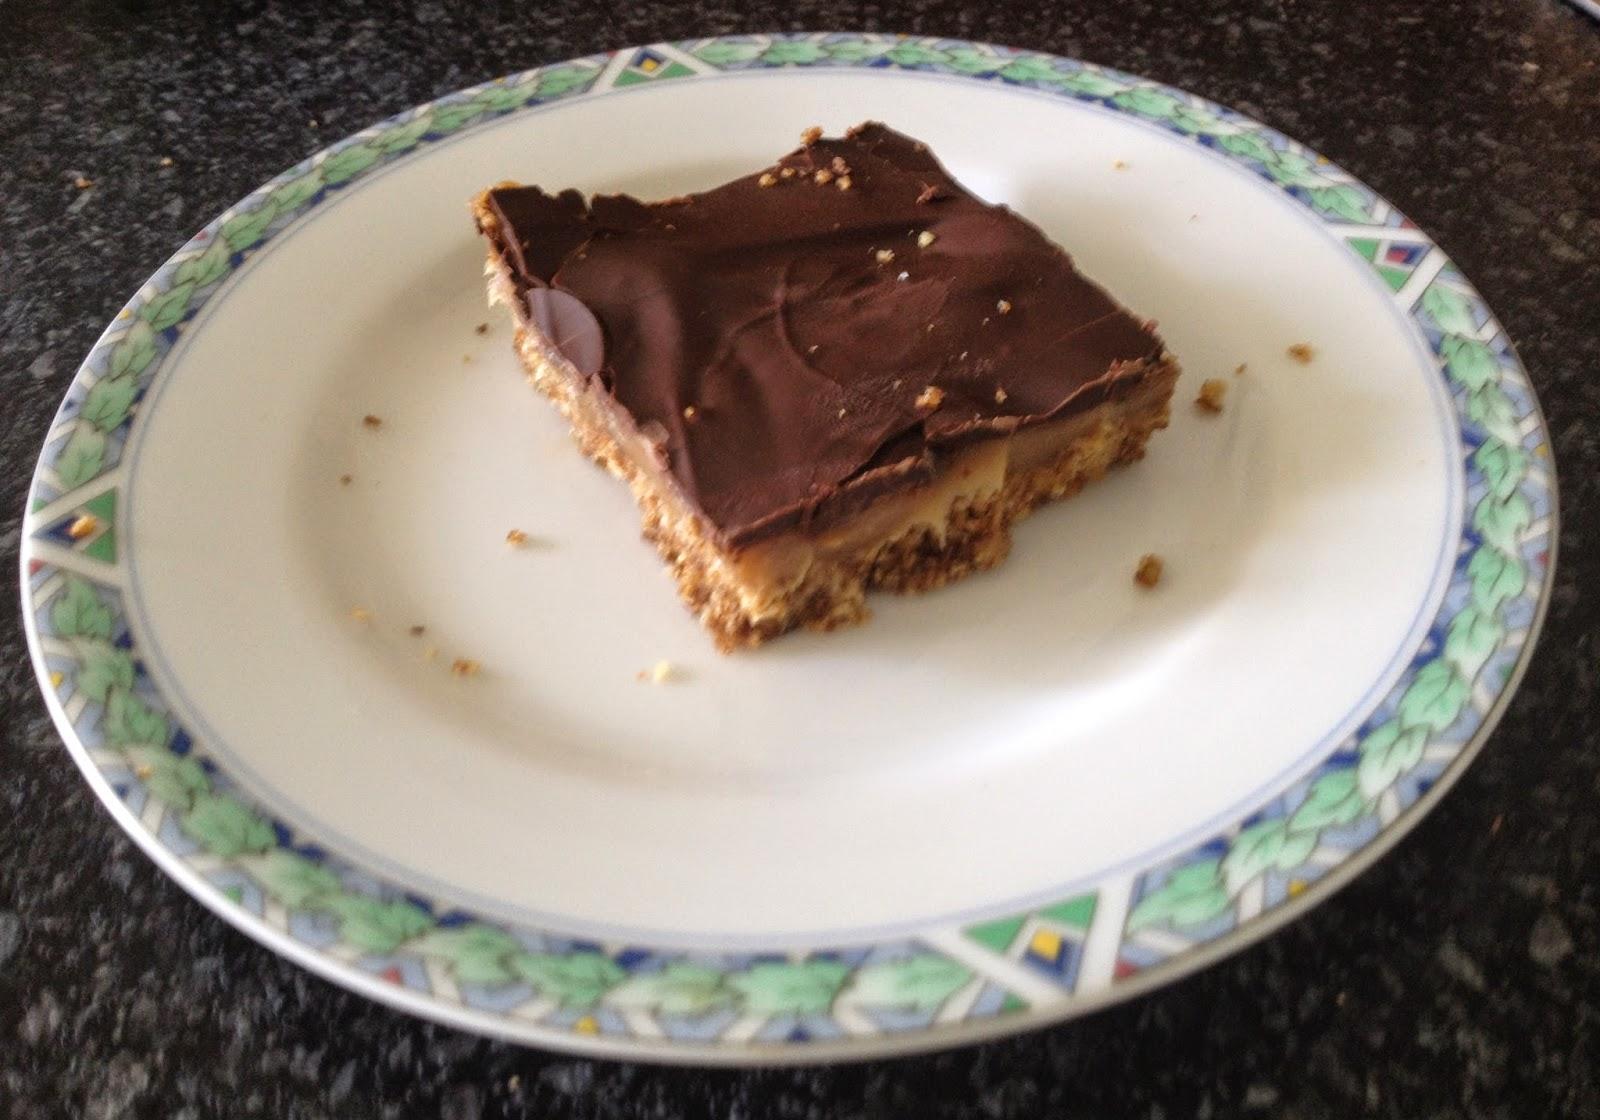 Twix taart (Millionaires shortbread)